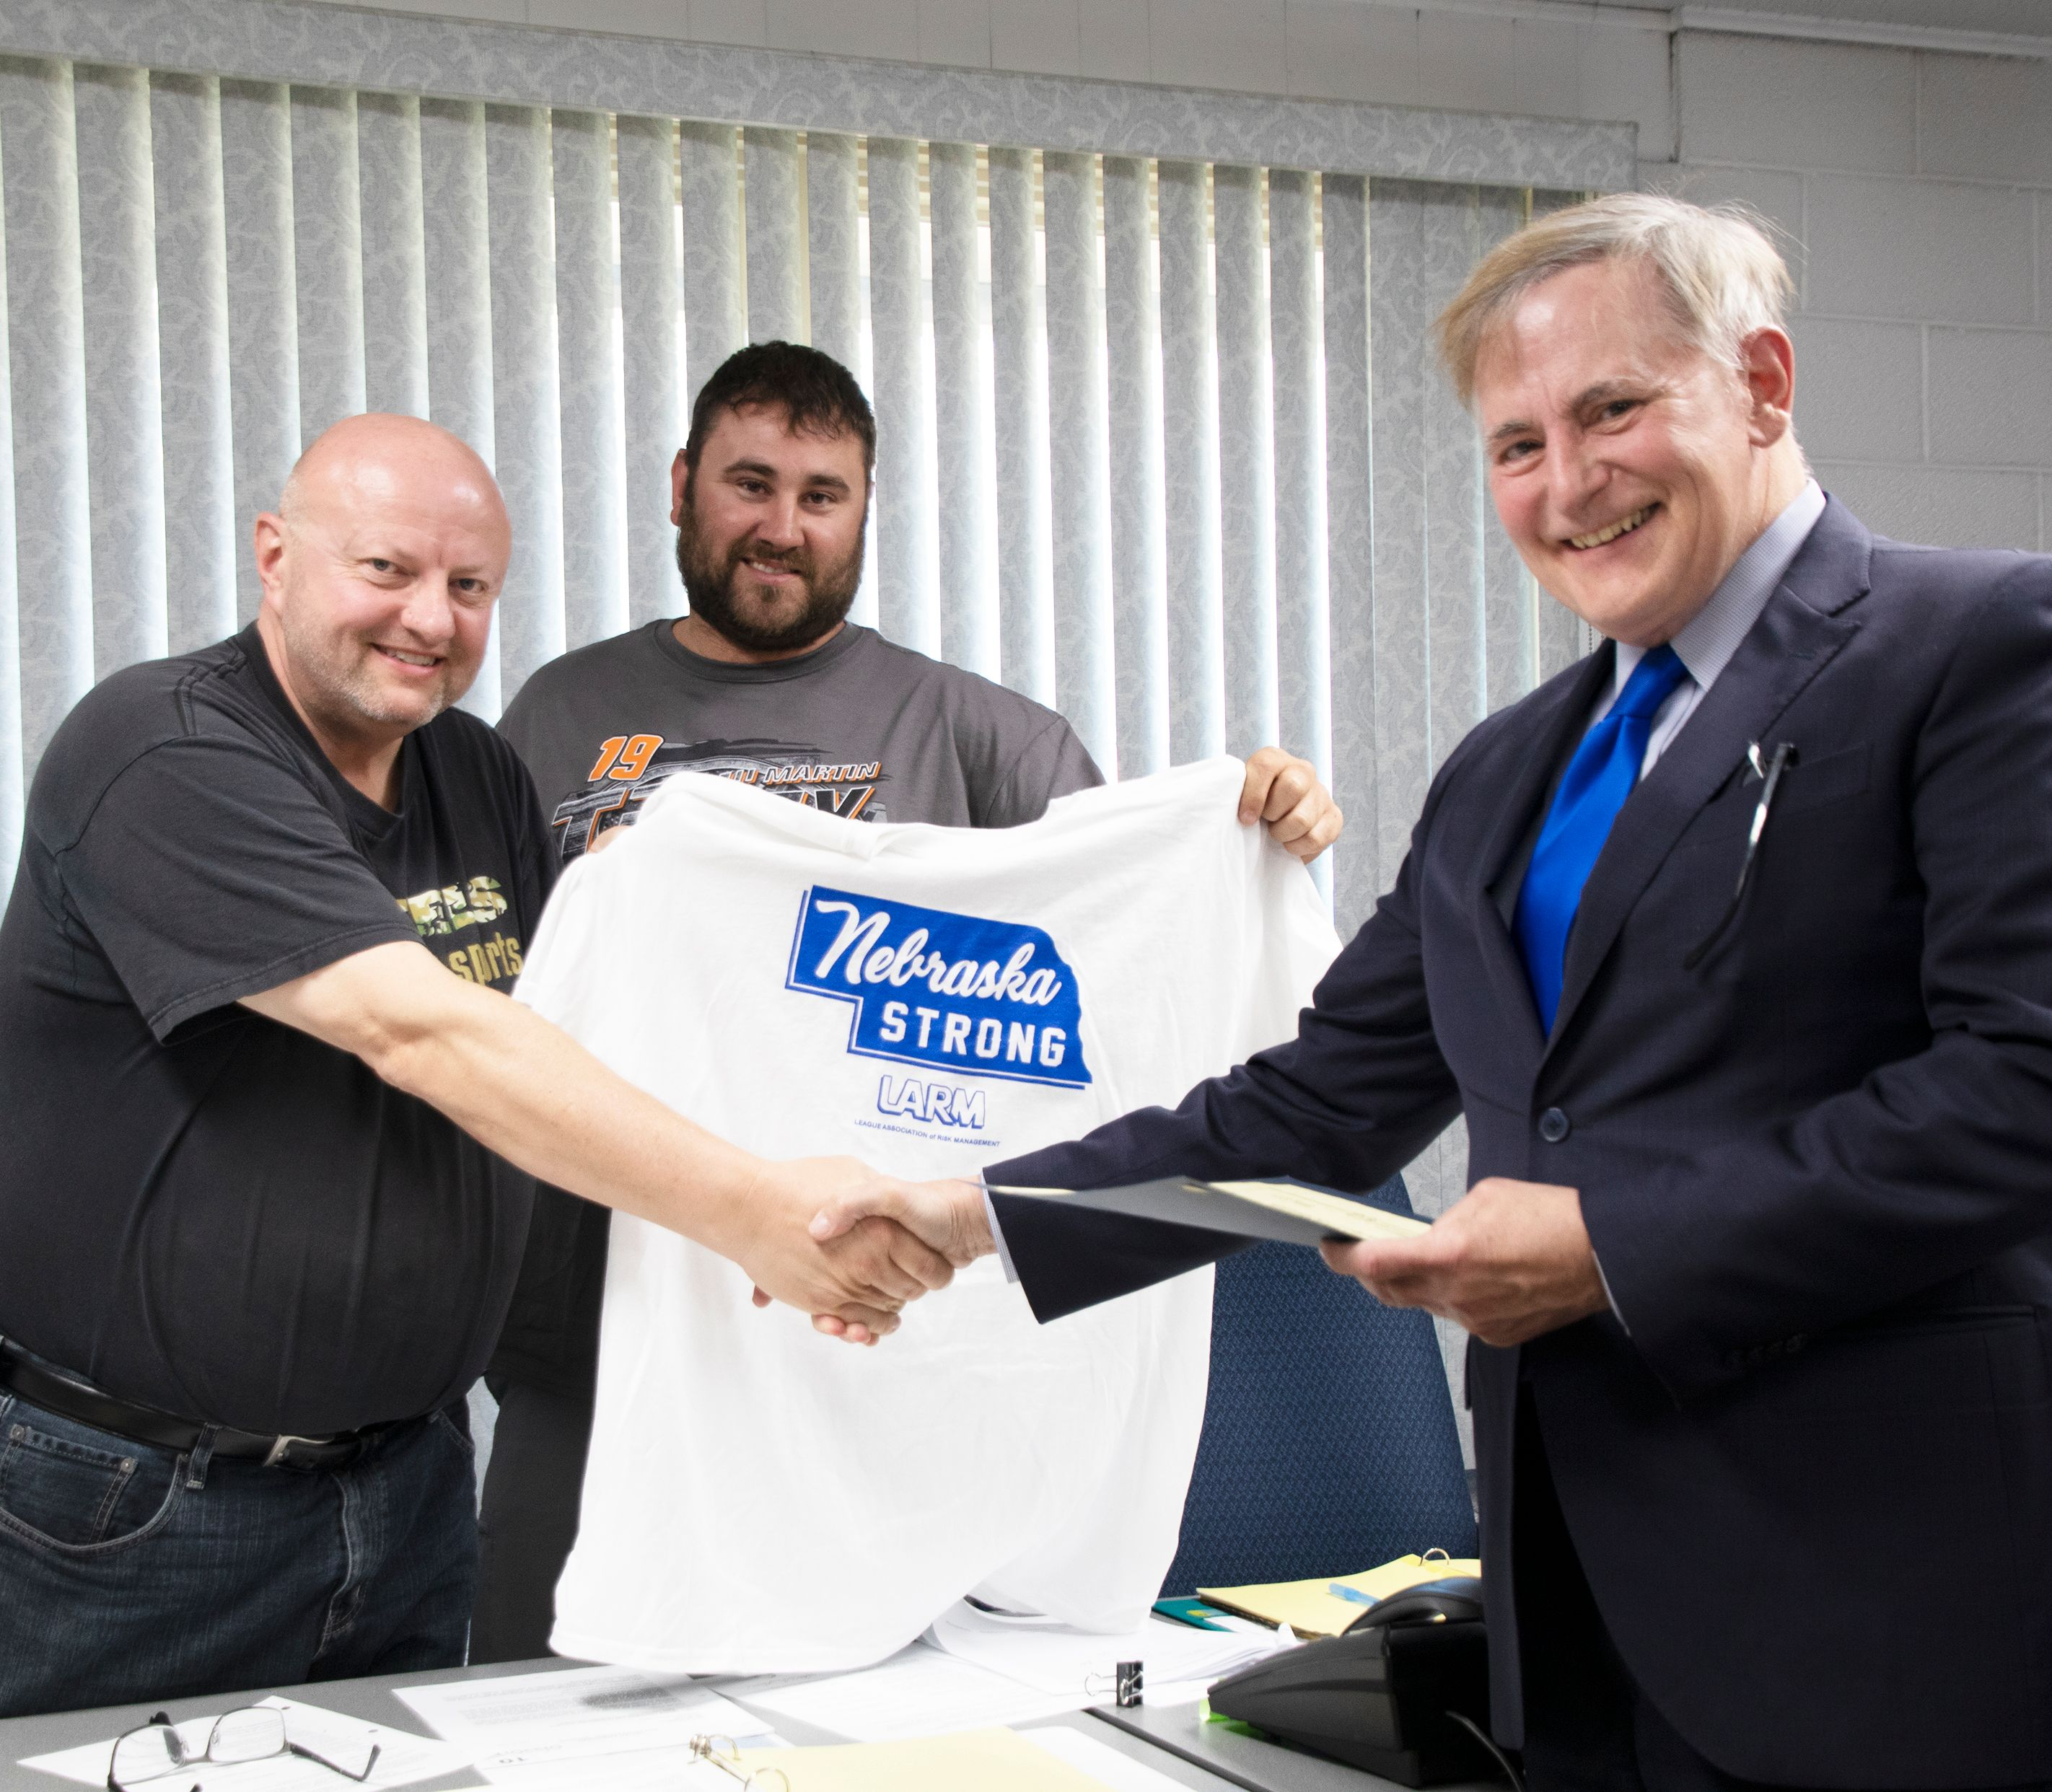 $500 Disaster Funding to David City